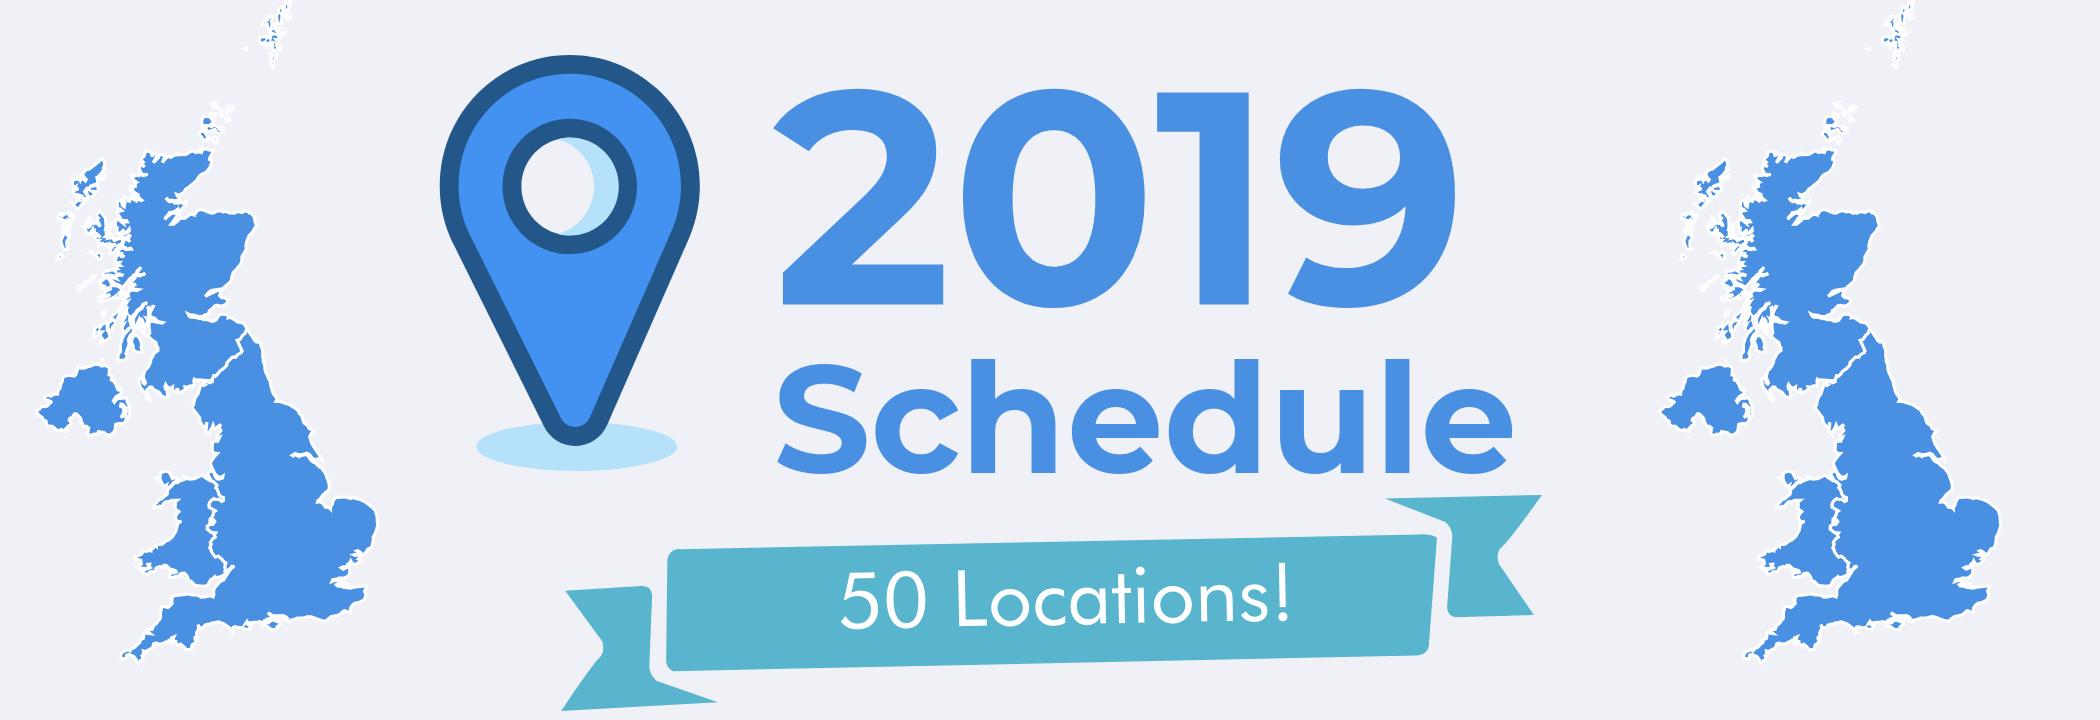 2019 schedule.png